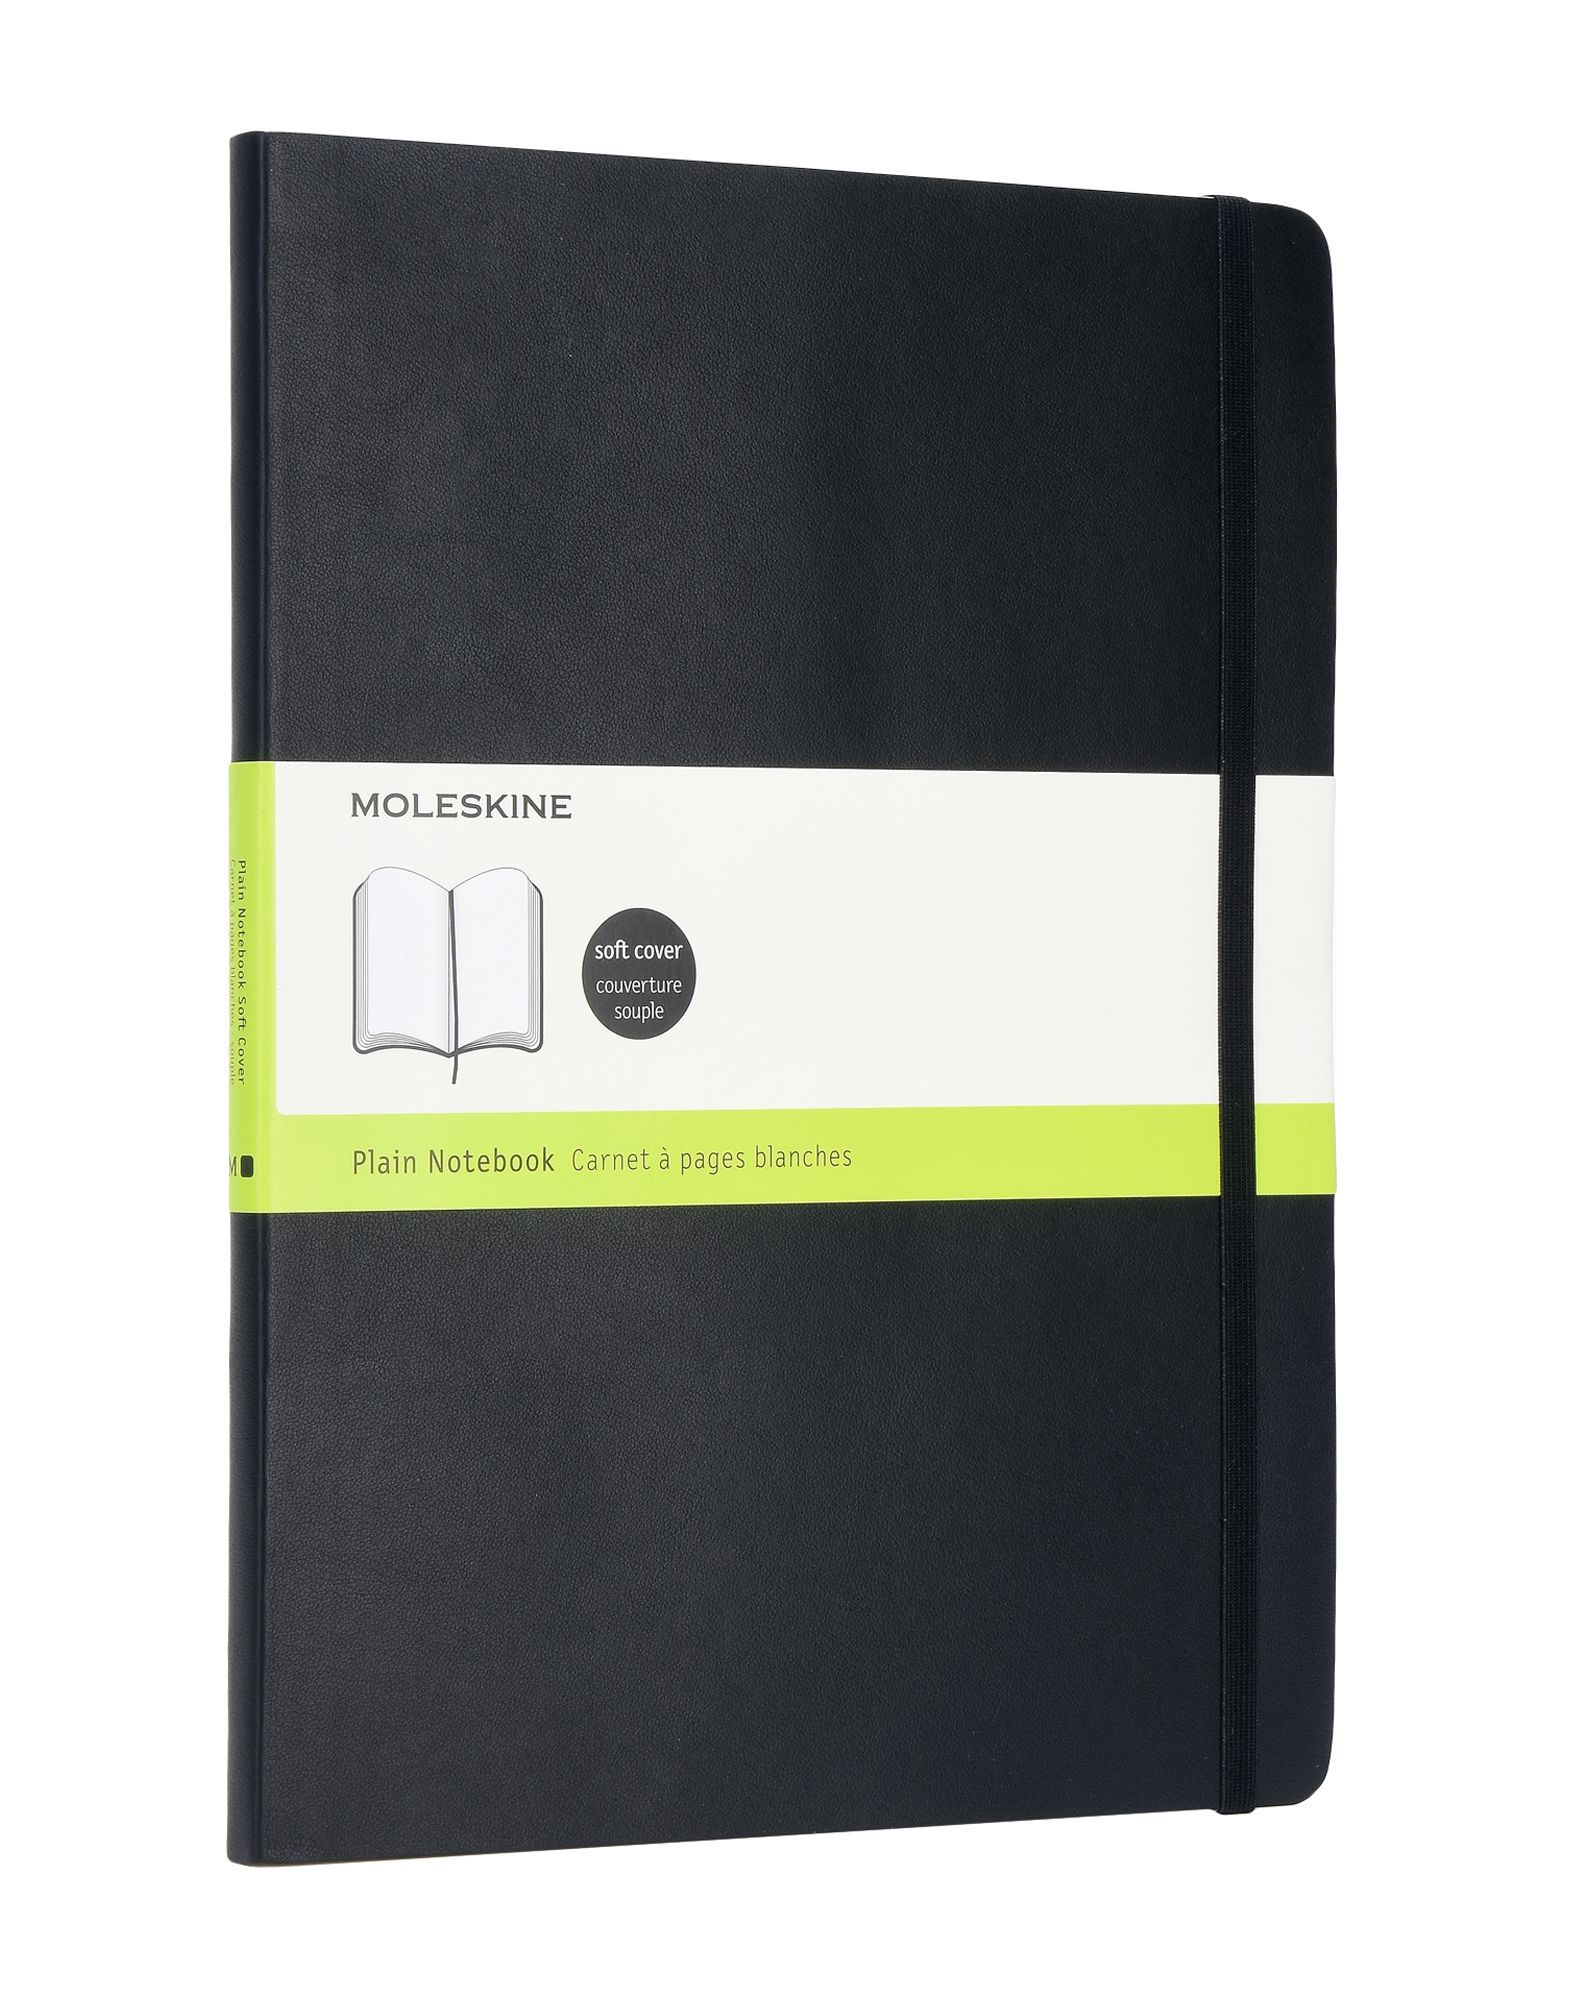 MOLESKINE Записная книжка nakabayashi записная книжка или блокнот